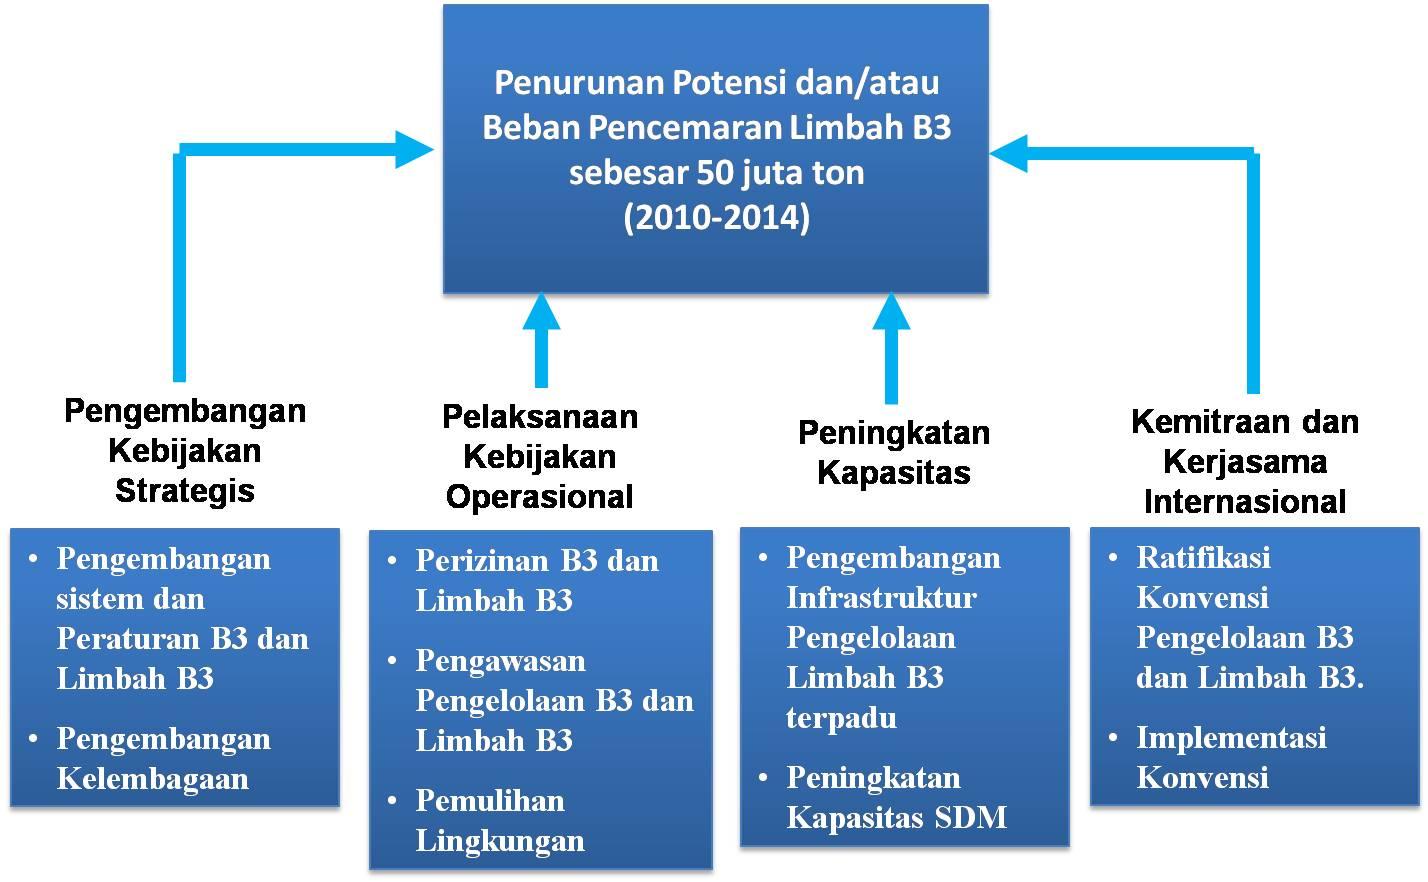 RPJM 2010-2014 Pengelolaan B3 Dan Limbah B3